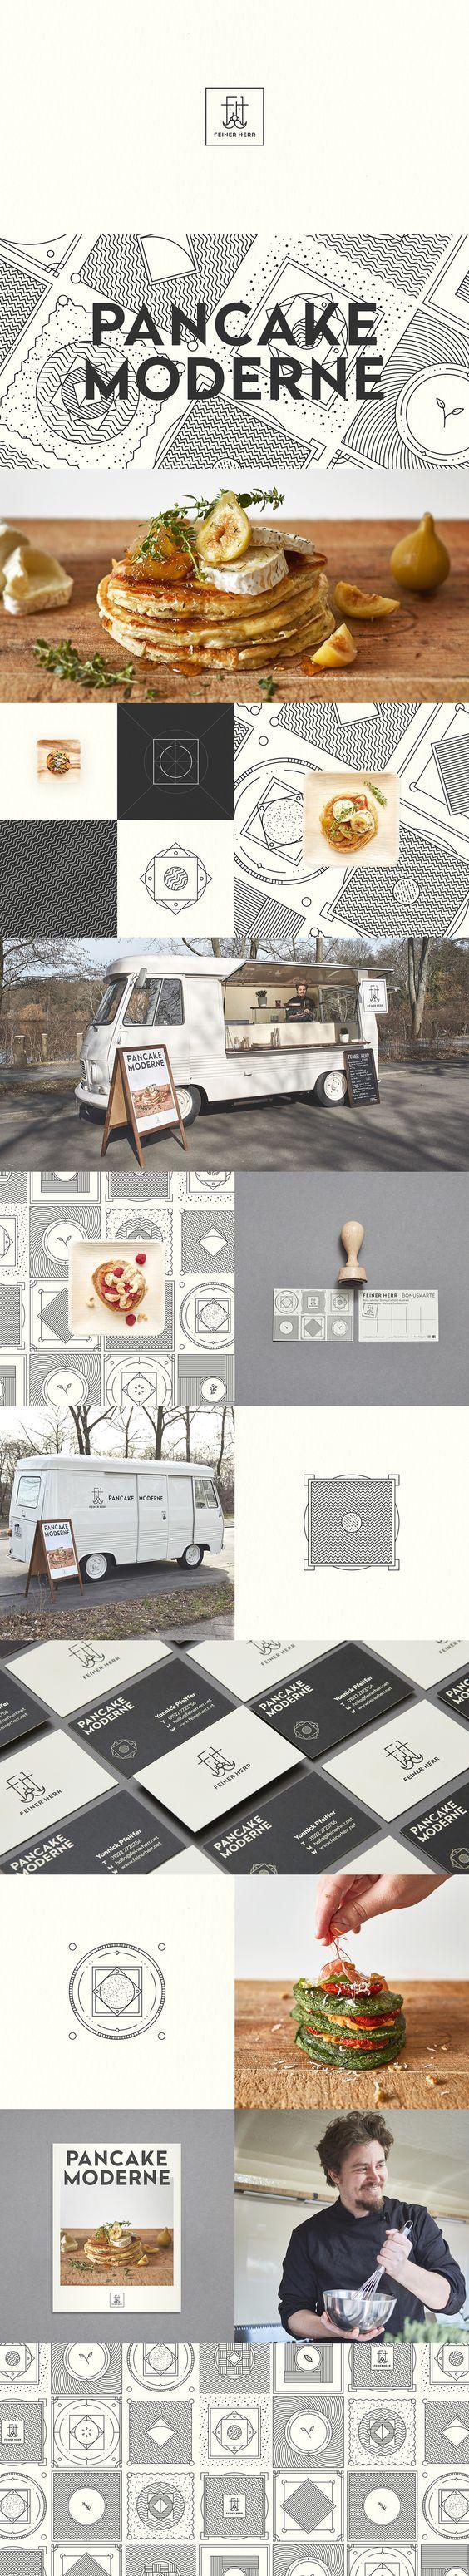 Feiner Herr Food Truck Branding by Hojin Kang | Fivestar Branding Agency – Design and Branding Agency & Curated Inspiration Gallery